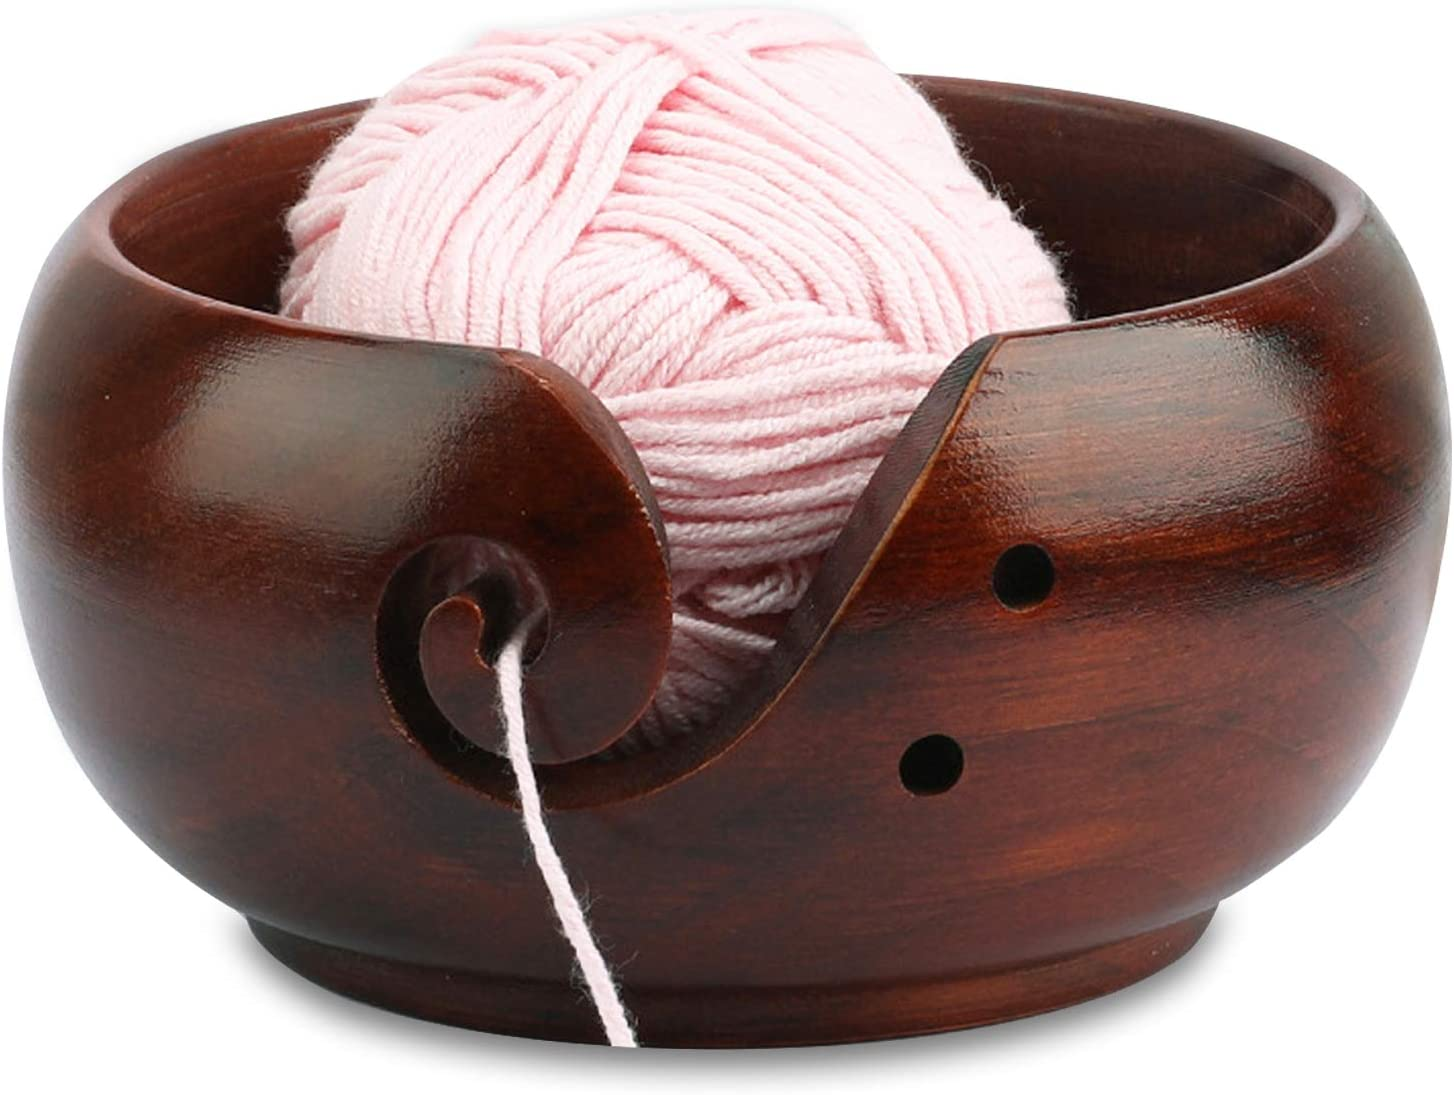 Yarn Bowl Wood Wooden Dallas Albuquerque Mall Mall for L Crochet Knitting